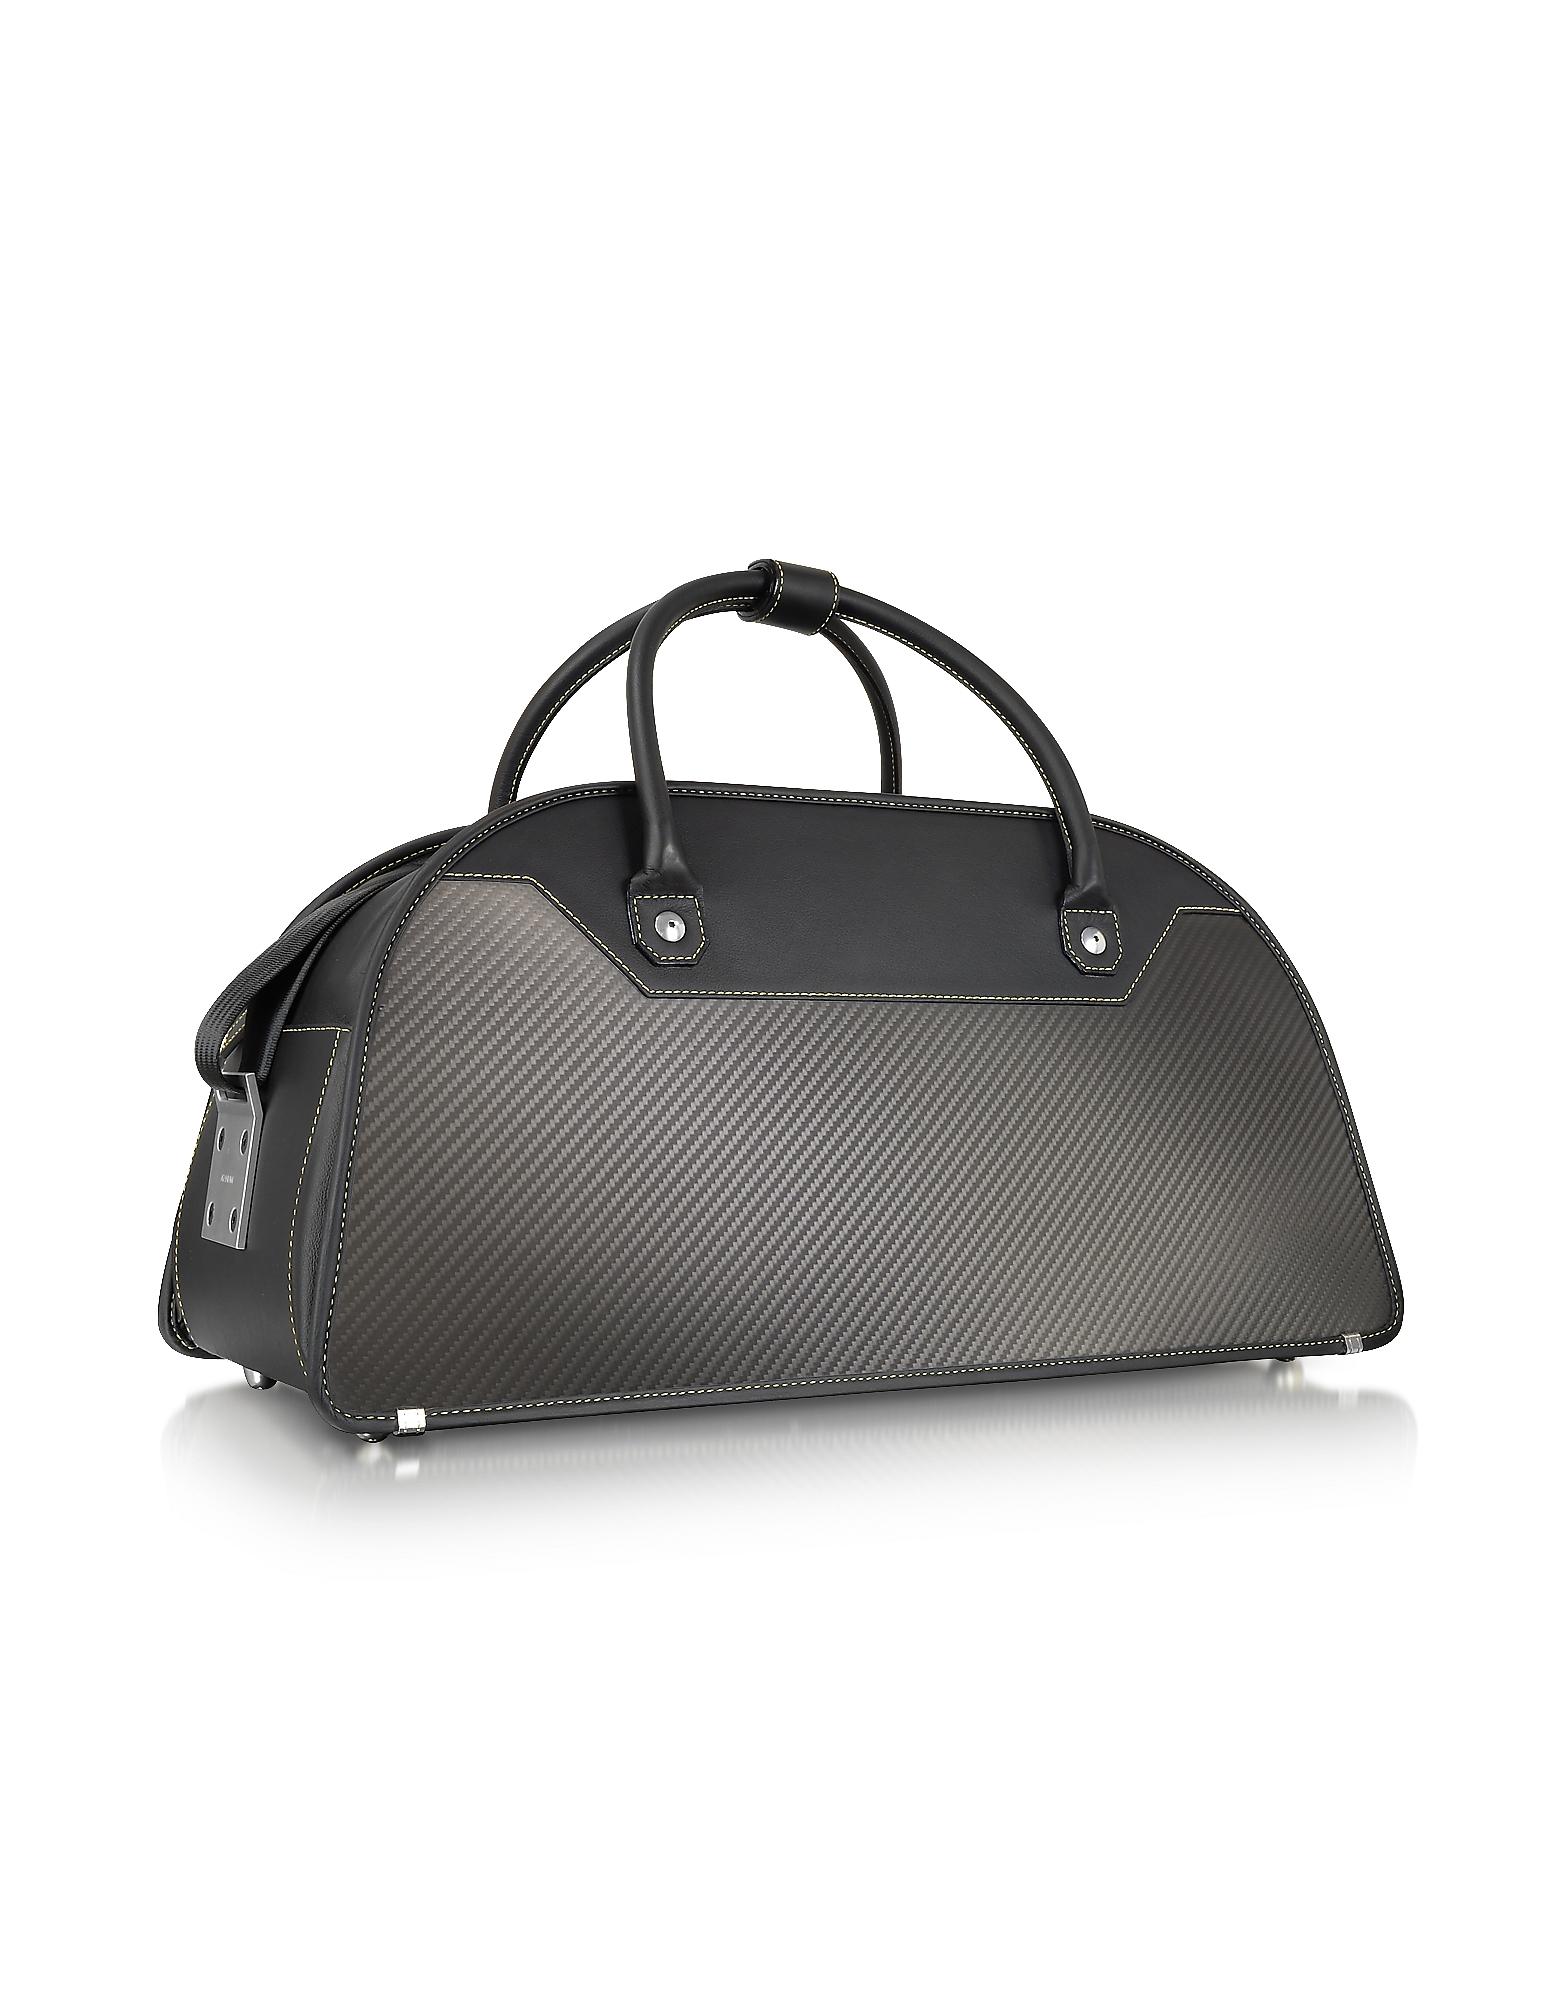 Aznom Travel Bags, Carbon Business - Carbon Fiber Weekender Bag